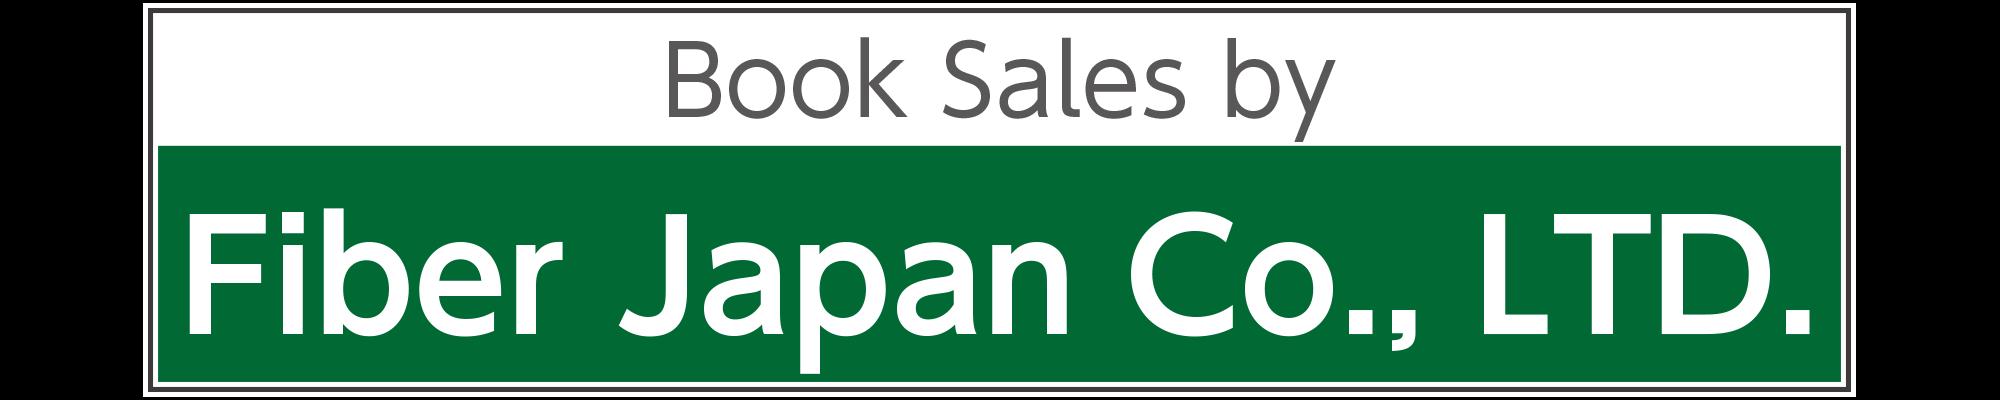 English Rakugo Book by Team Yosshy — Book Sales by Fiber Japan Co., LTD.